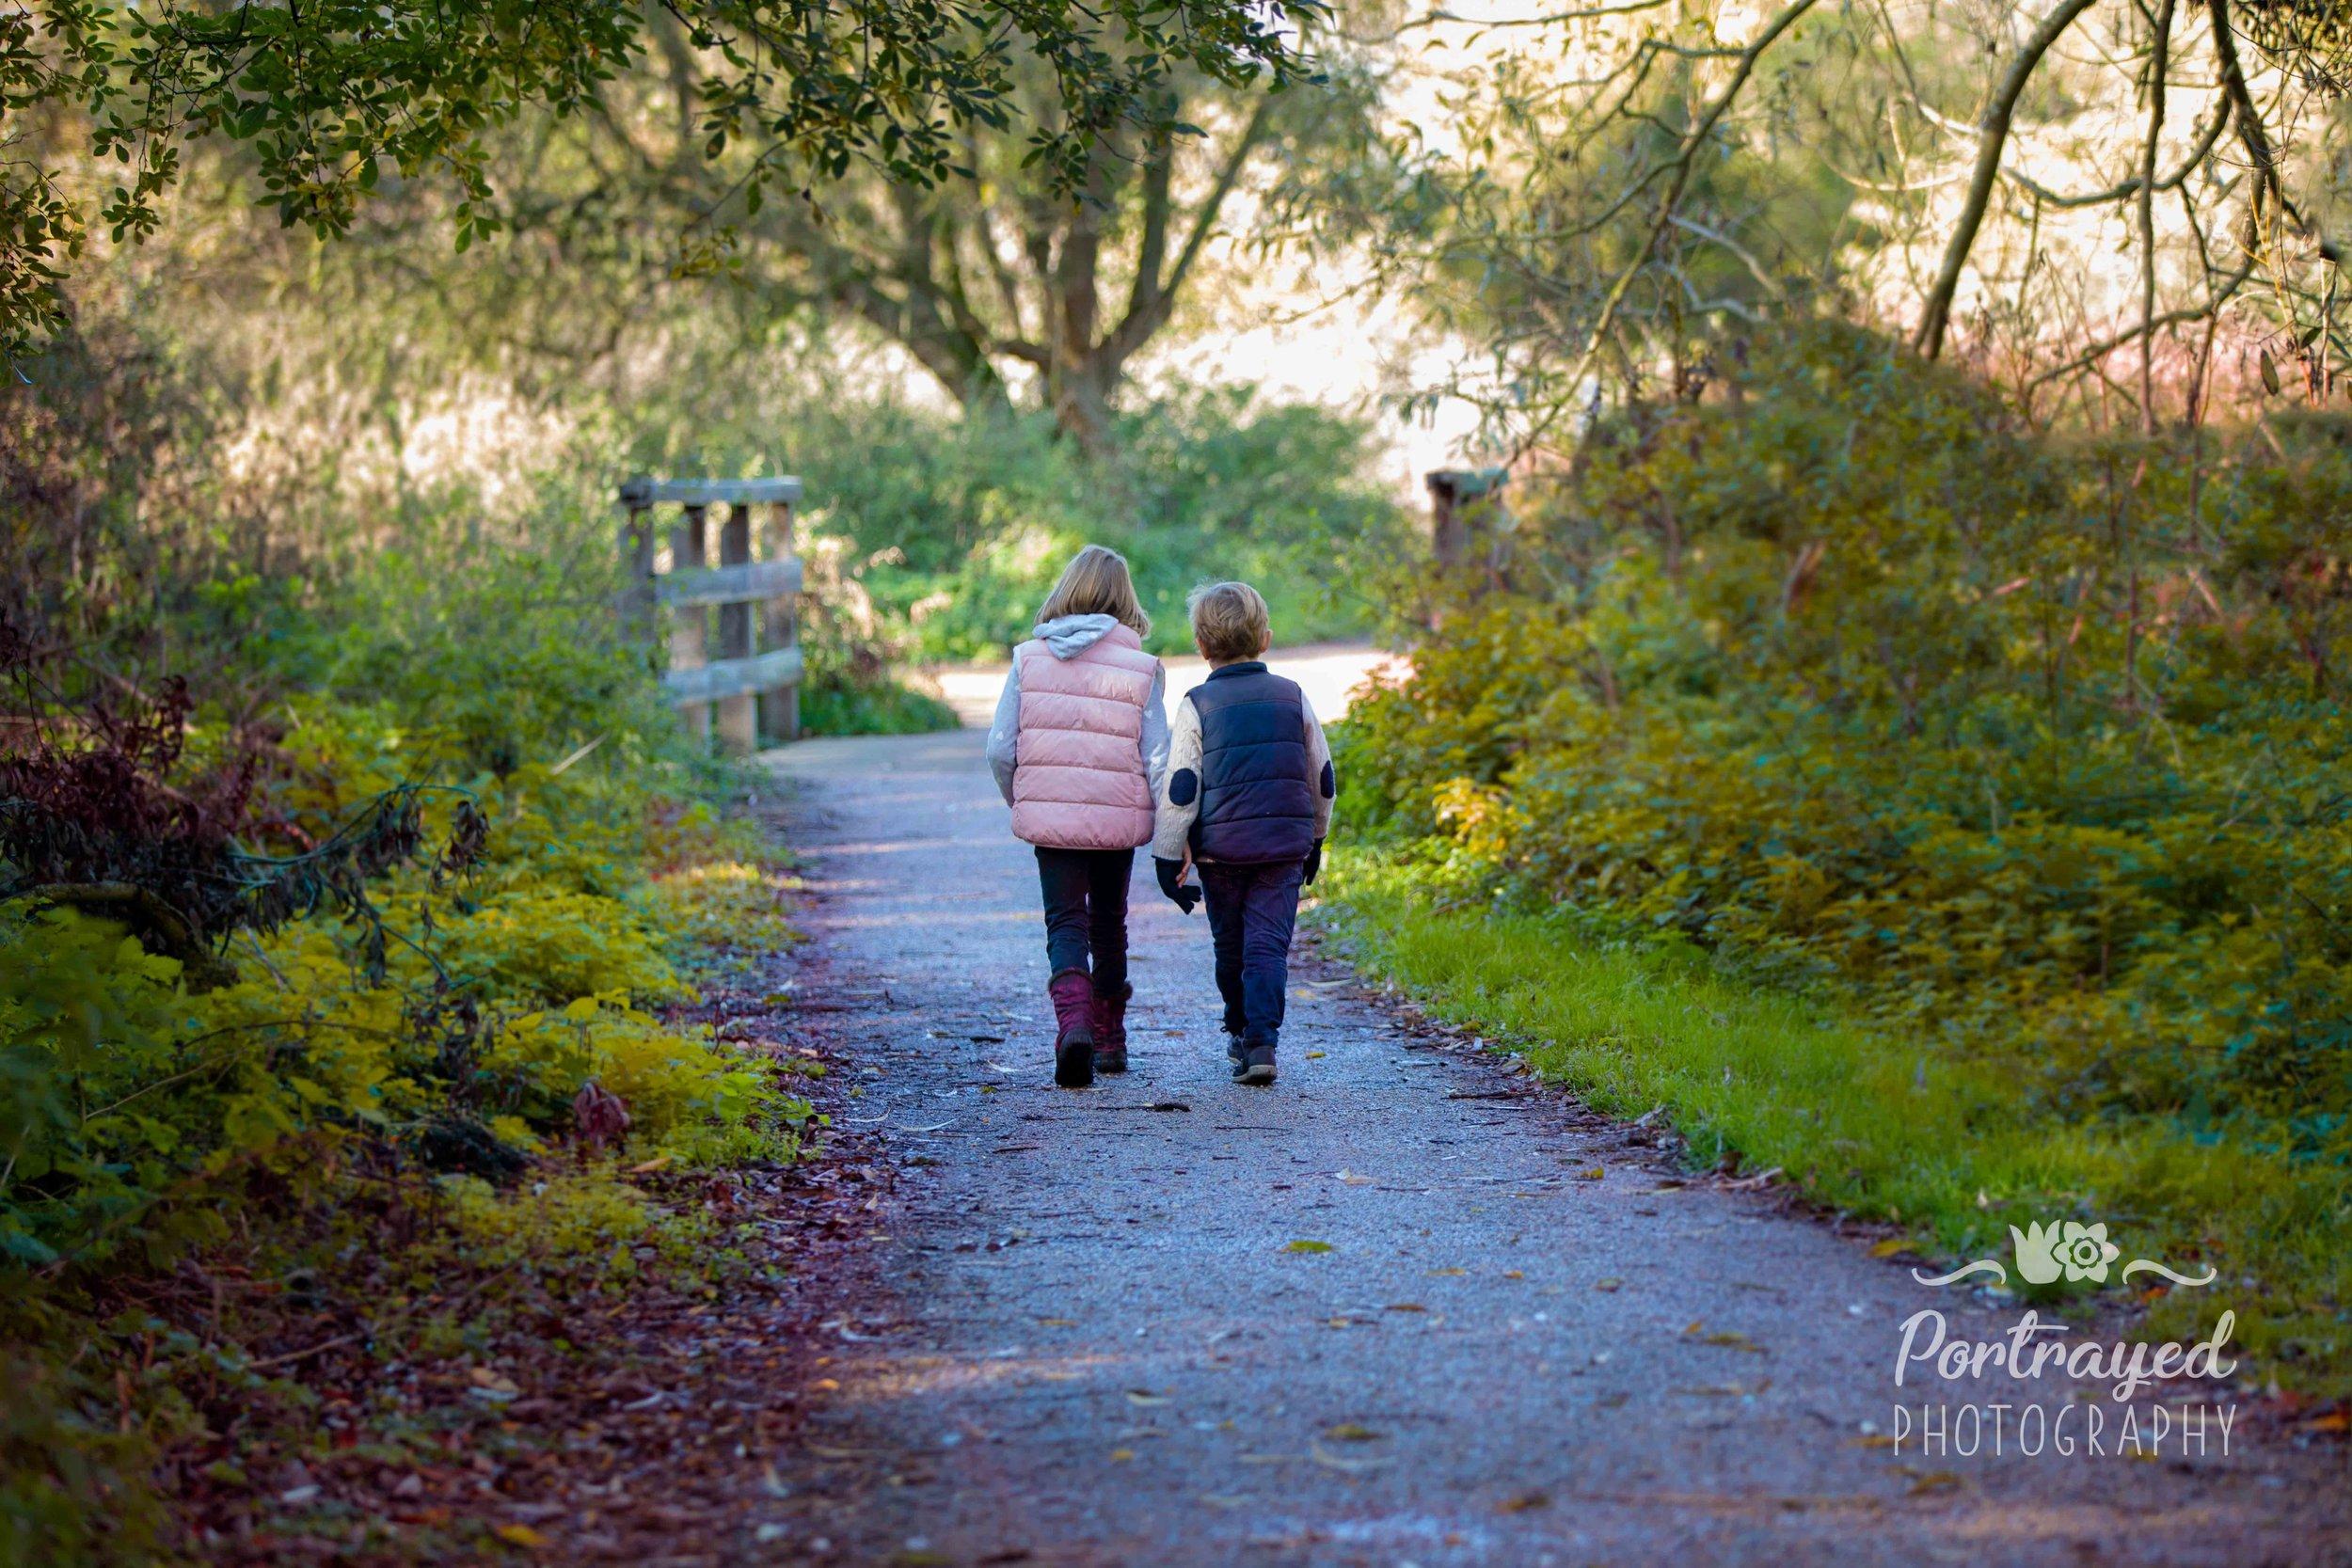 Along the Wandle Trail